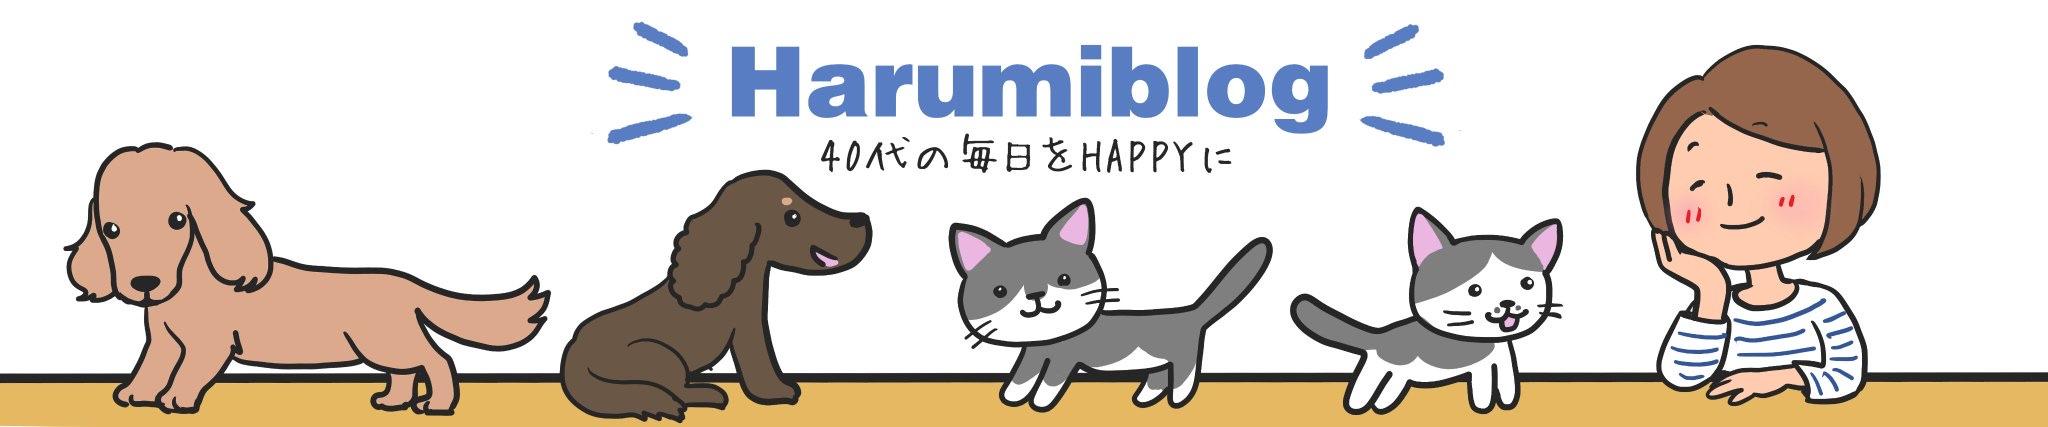 Harumiblog